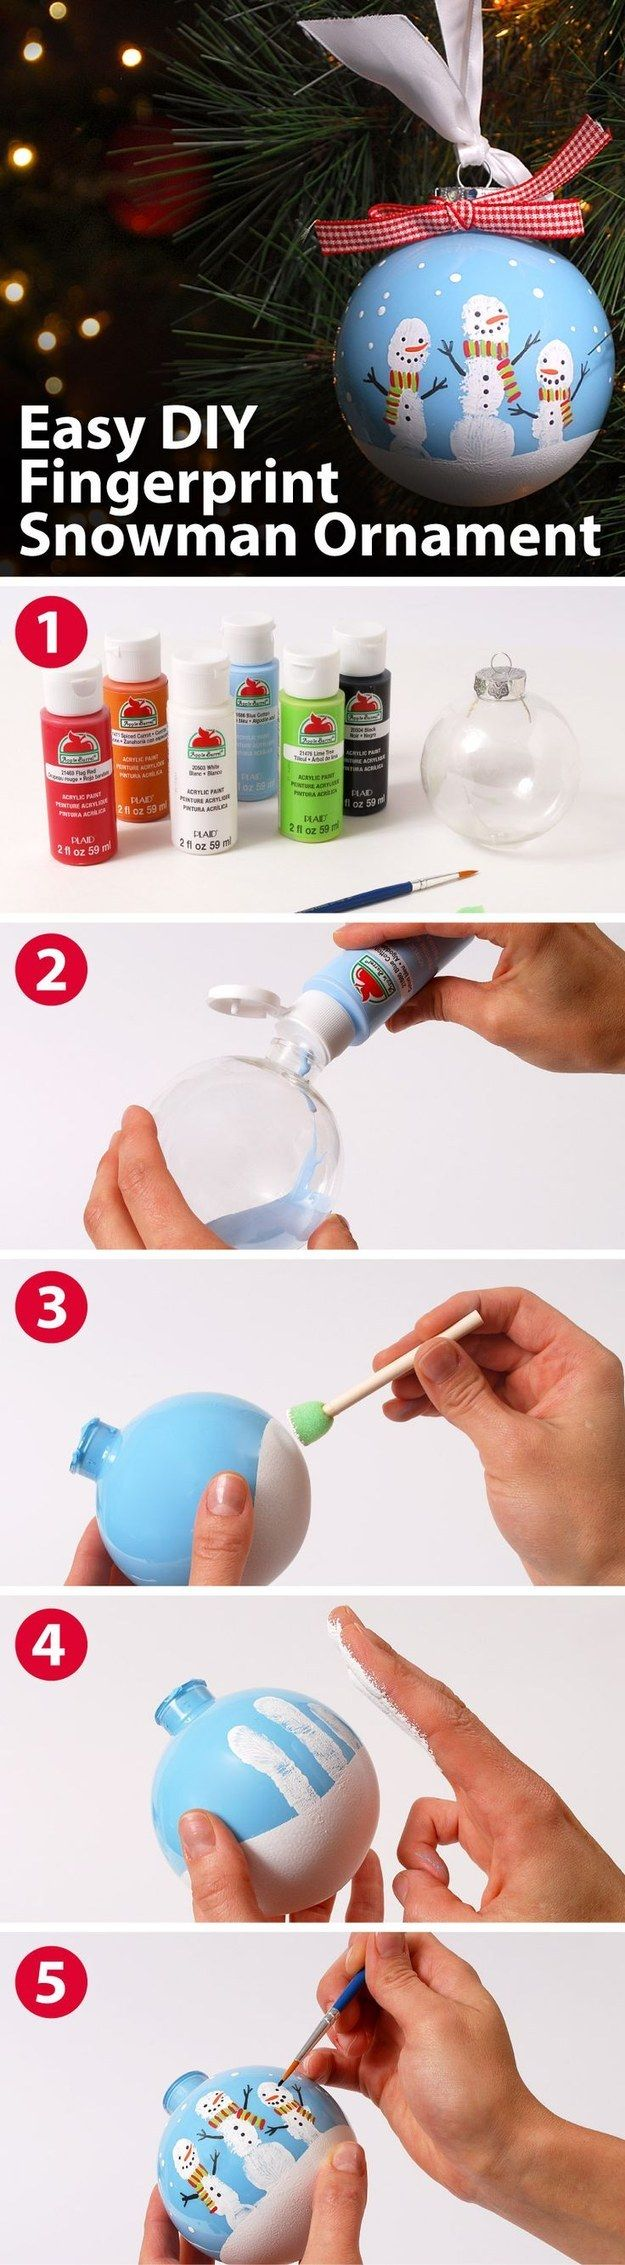 DIY Fingerprint Snowman Ornament | Community Post: 11 DIY Decoration Ideas That Refresh Your Christmas